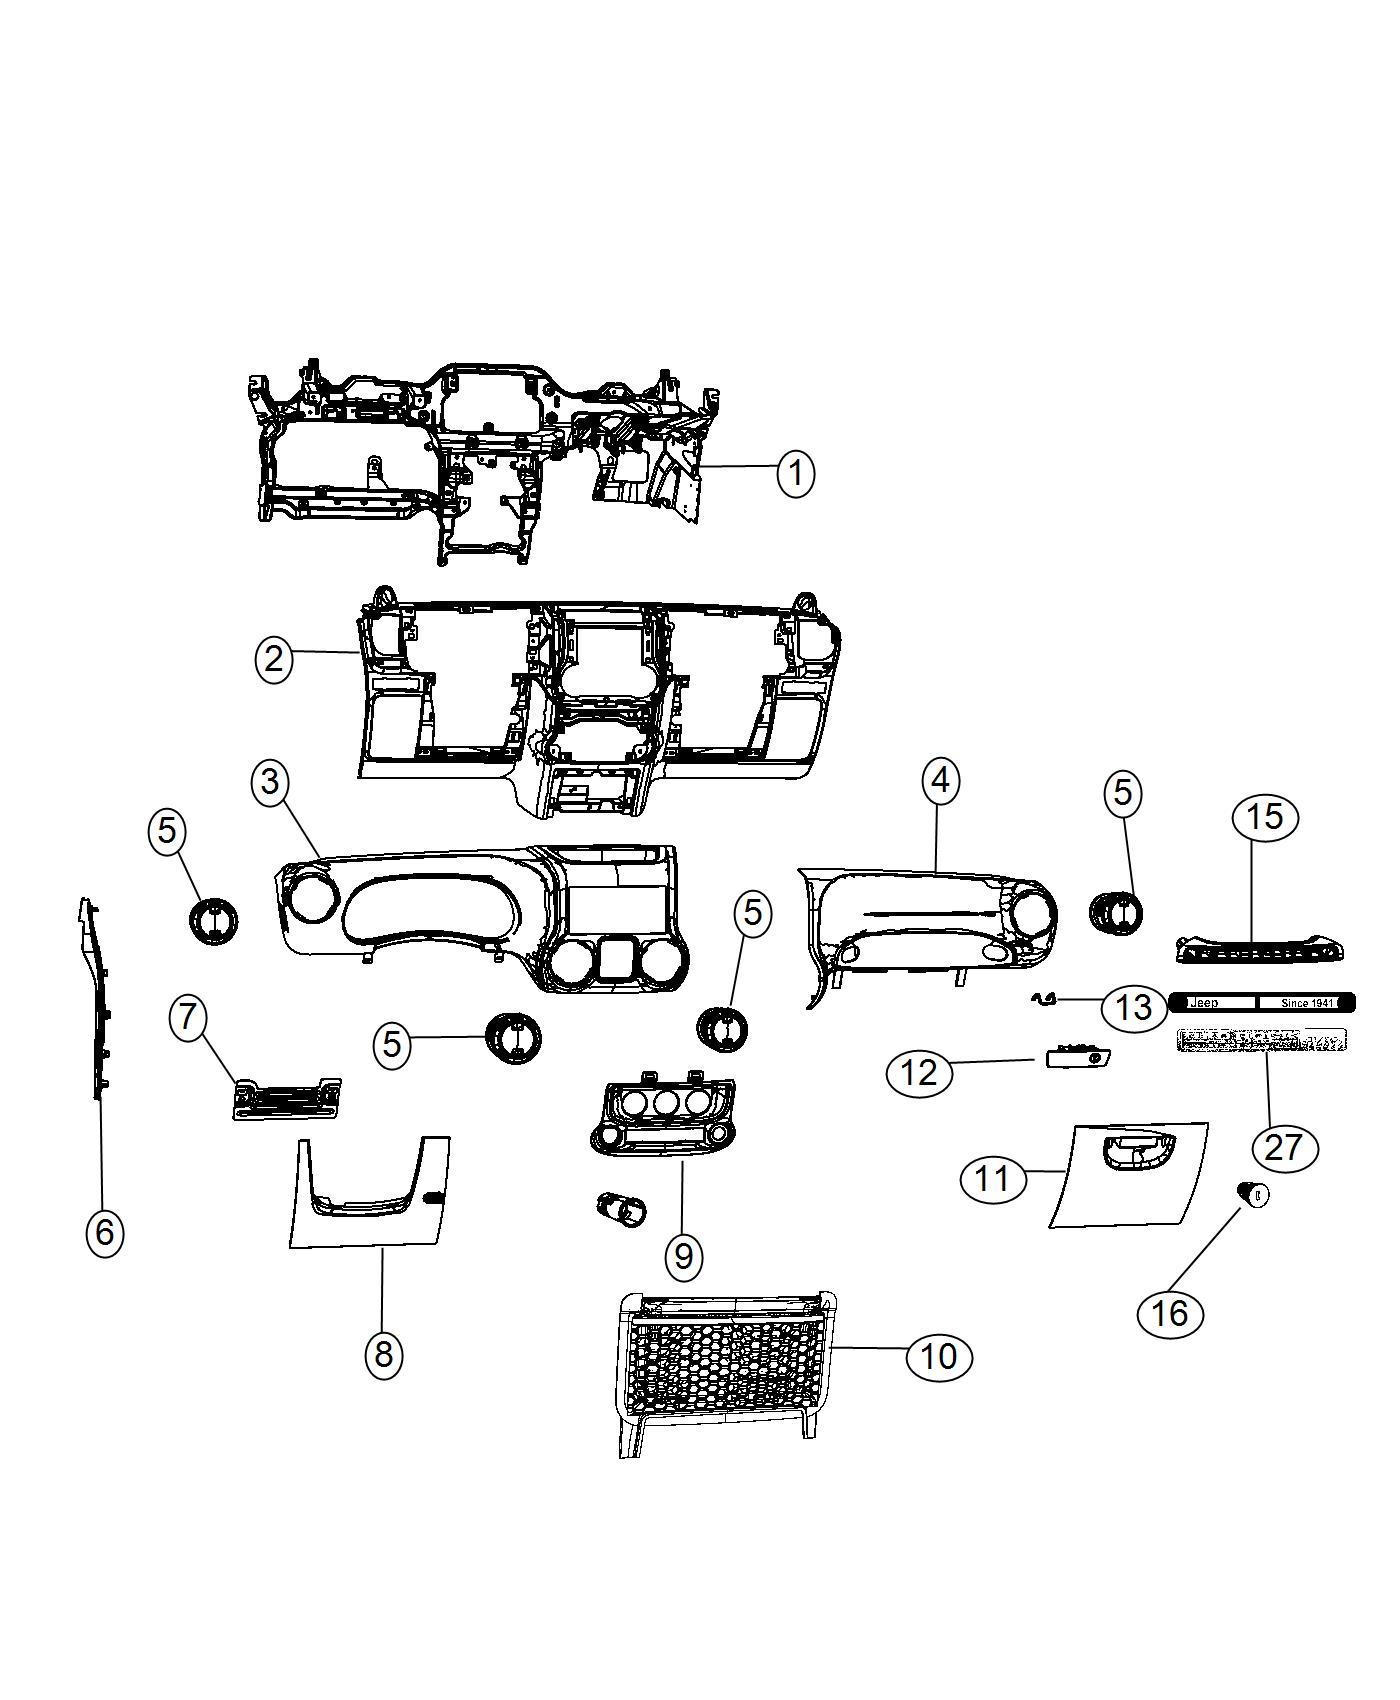 Jeep Wrangler Reinforcement. Instrument panel. Trim: [no